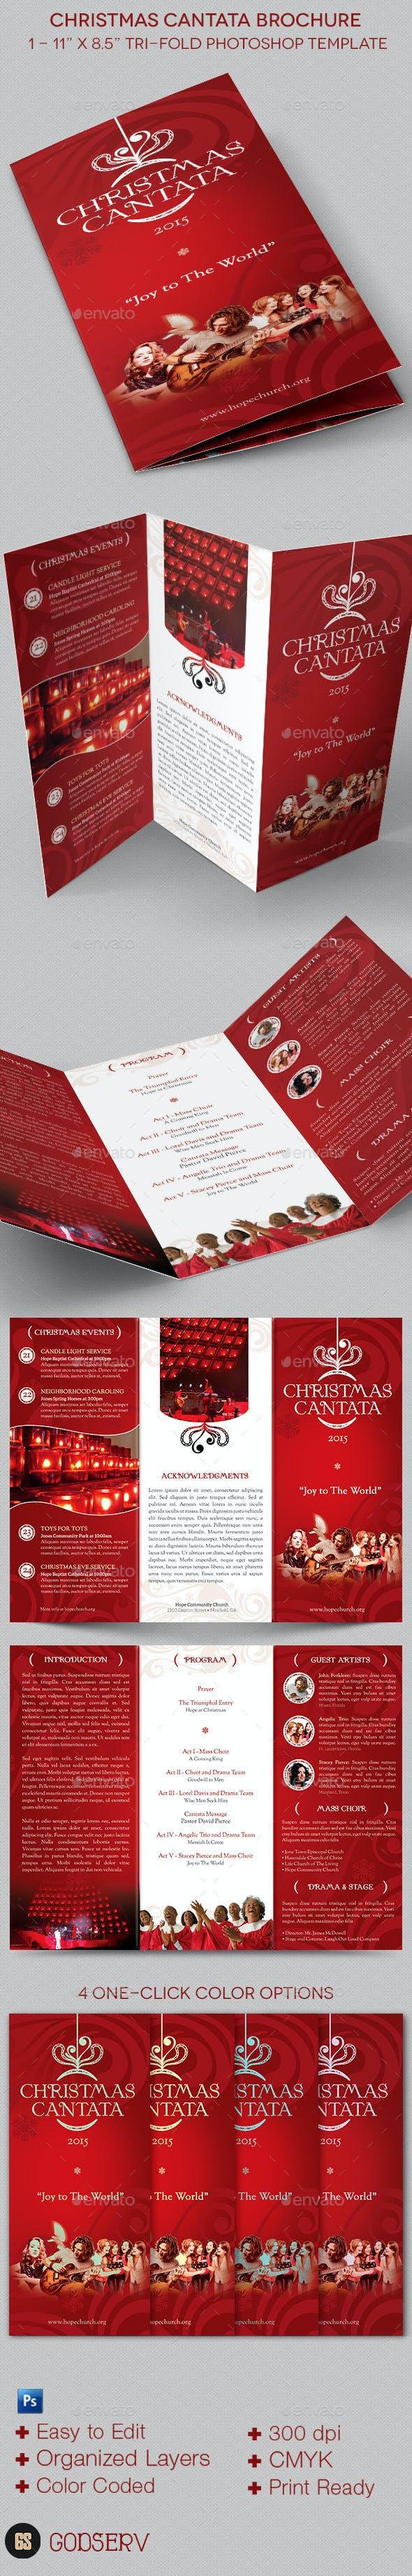 christmas cantata brochure template by godserv graphicriver